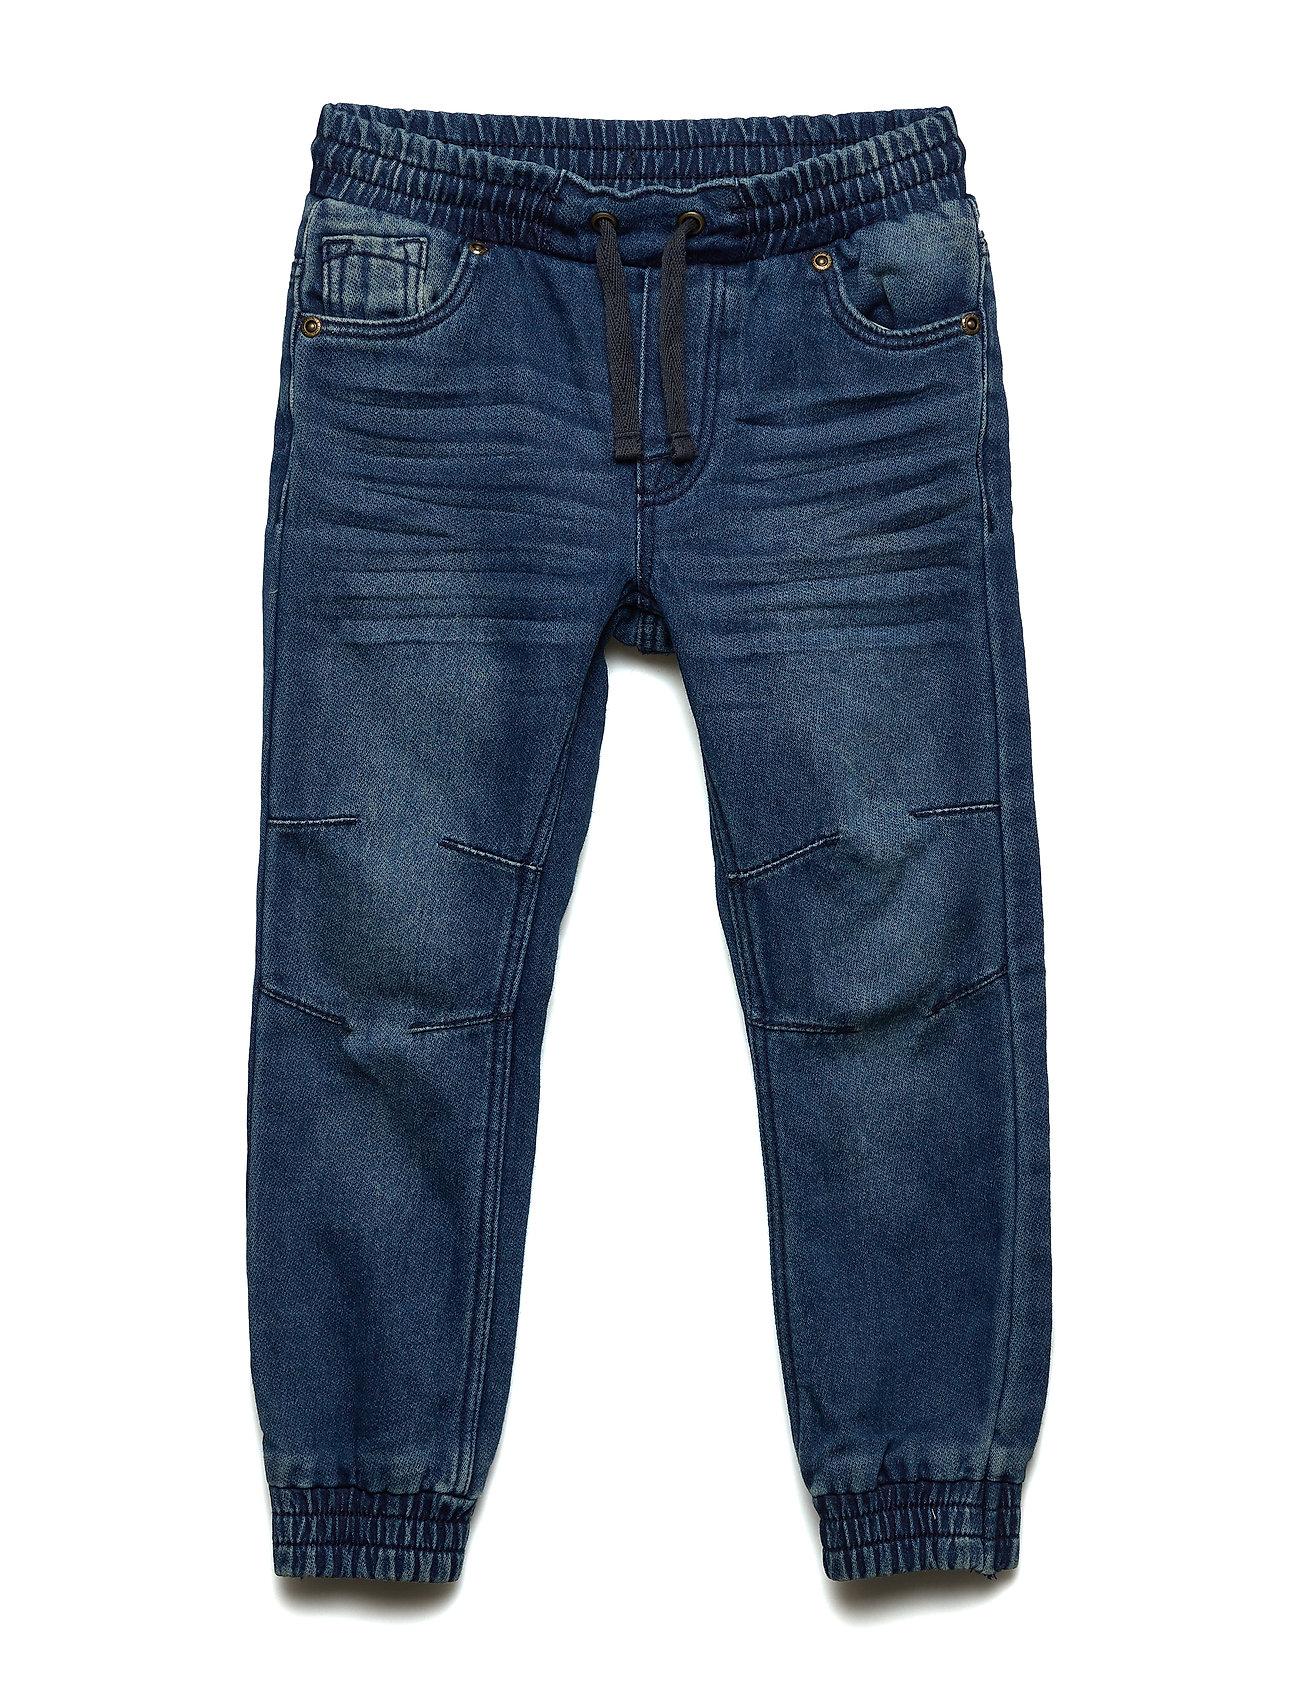 Polarn O. Pyret Jeans Slim Preschool